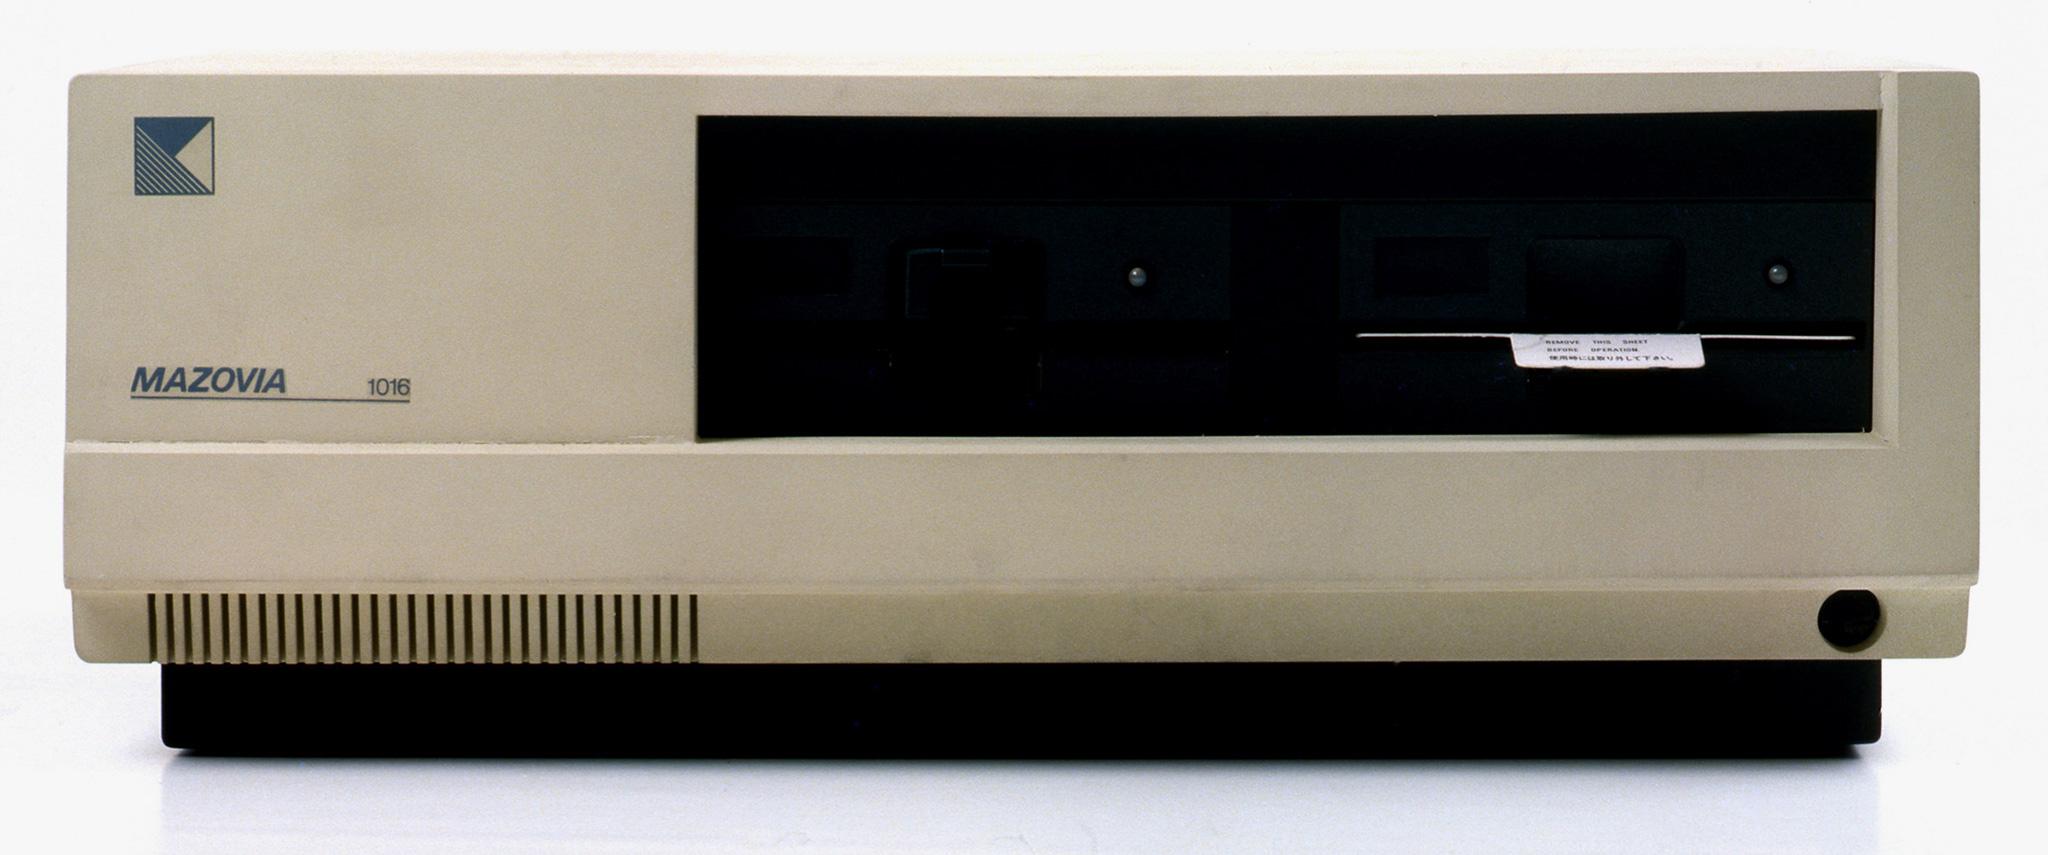 Prototyp jednostki centralnej mikrokomputera Mazovia 1016